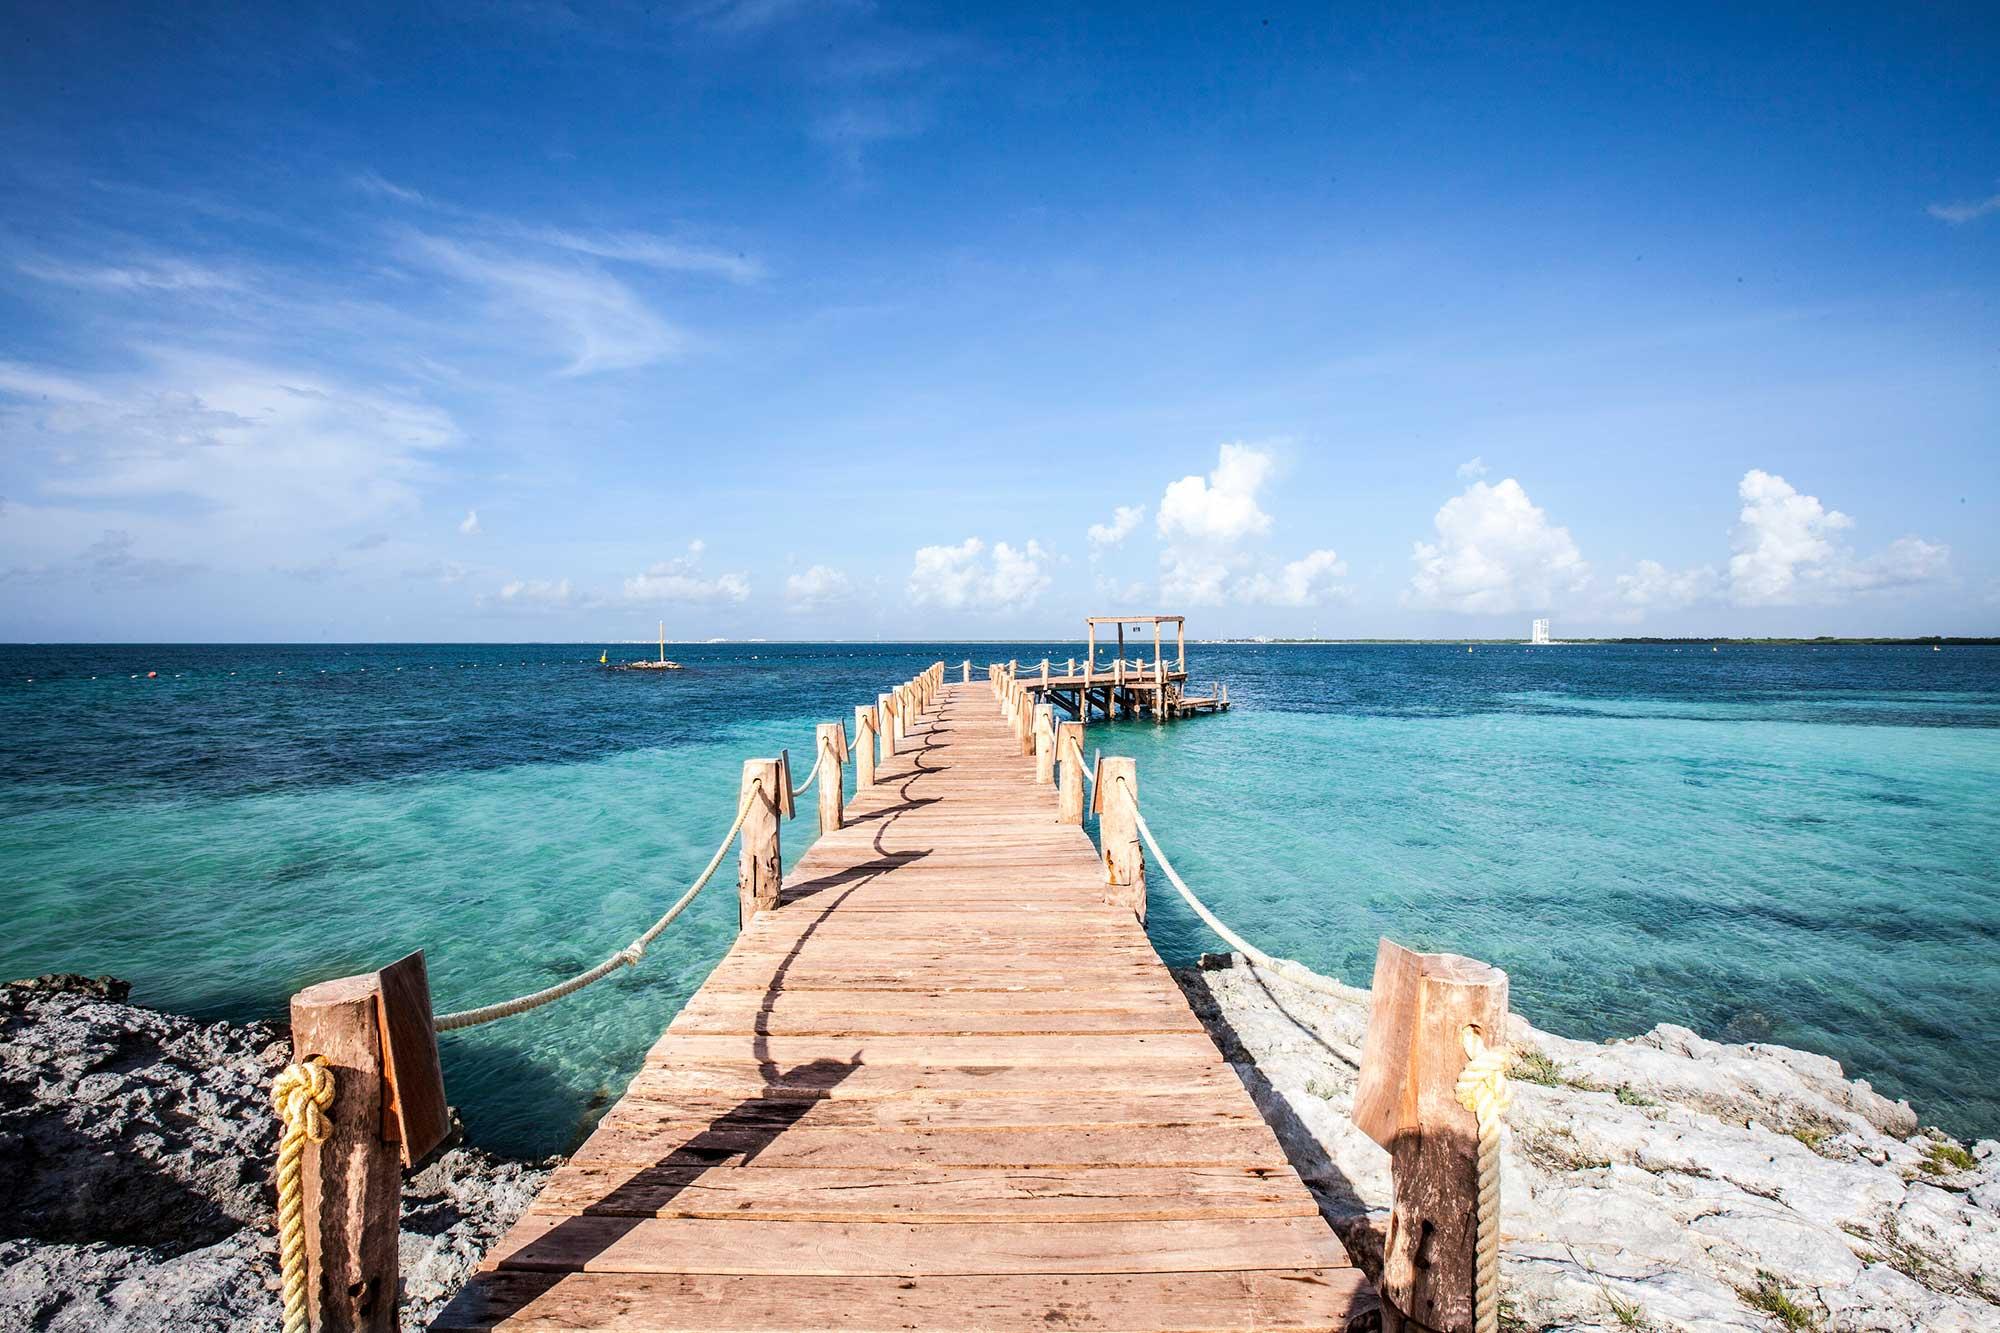 Wooden boardwalk pier extending into the ocean, Nizuc Resort & Spa, Yucatan, Mexico